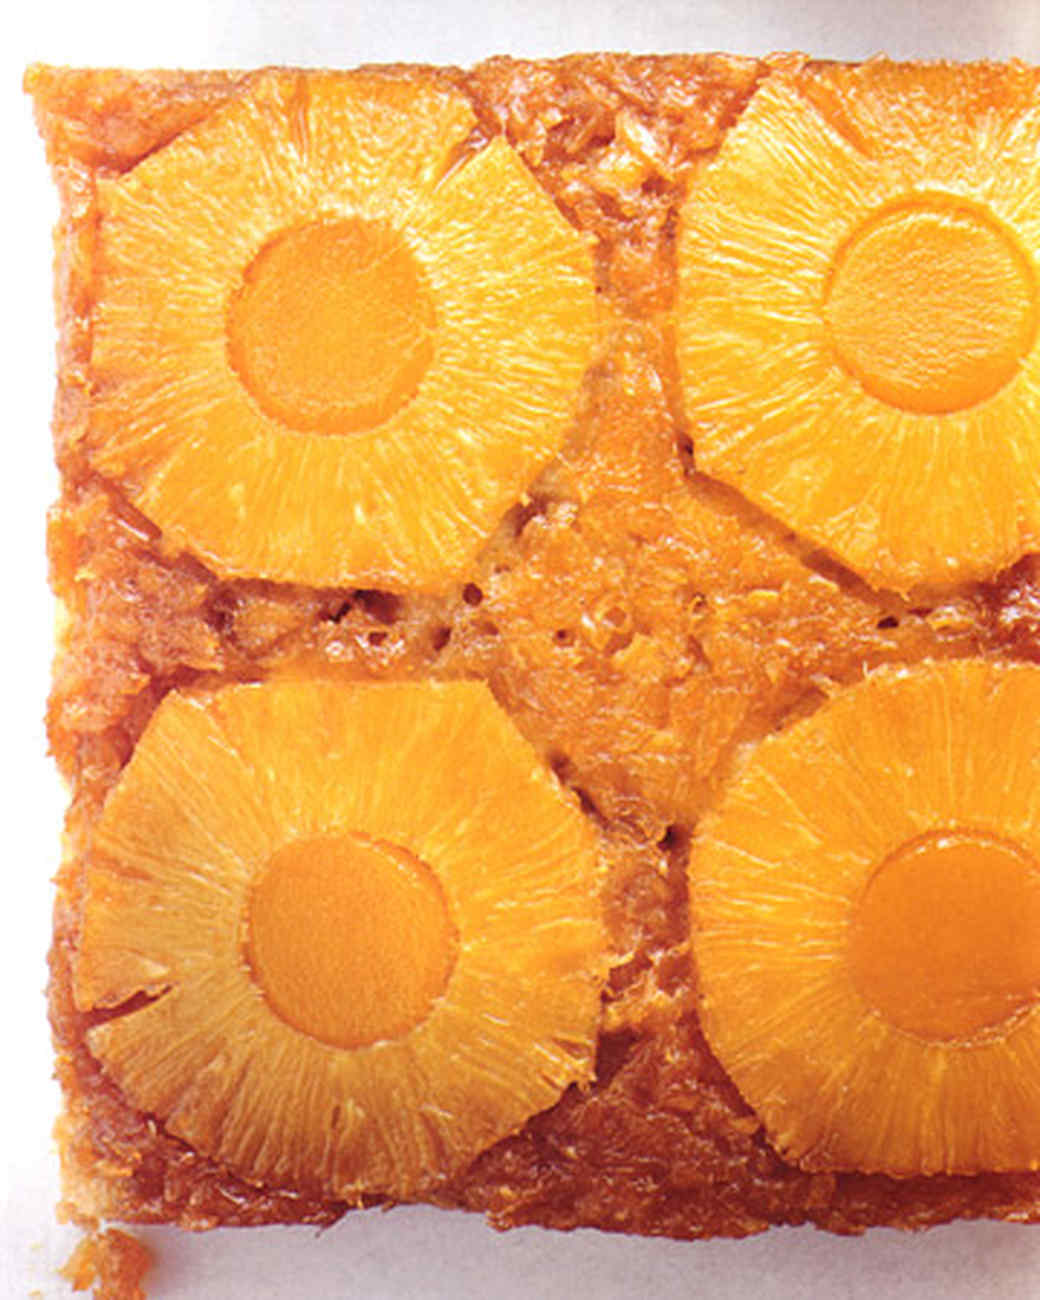 Pineapple-Mango Upside-Down Cake